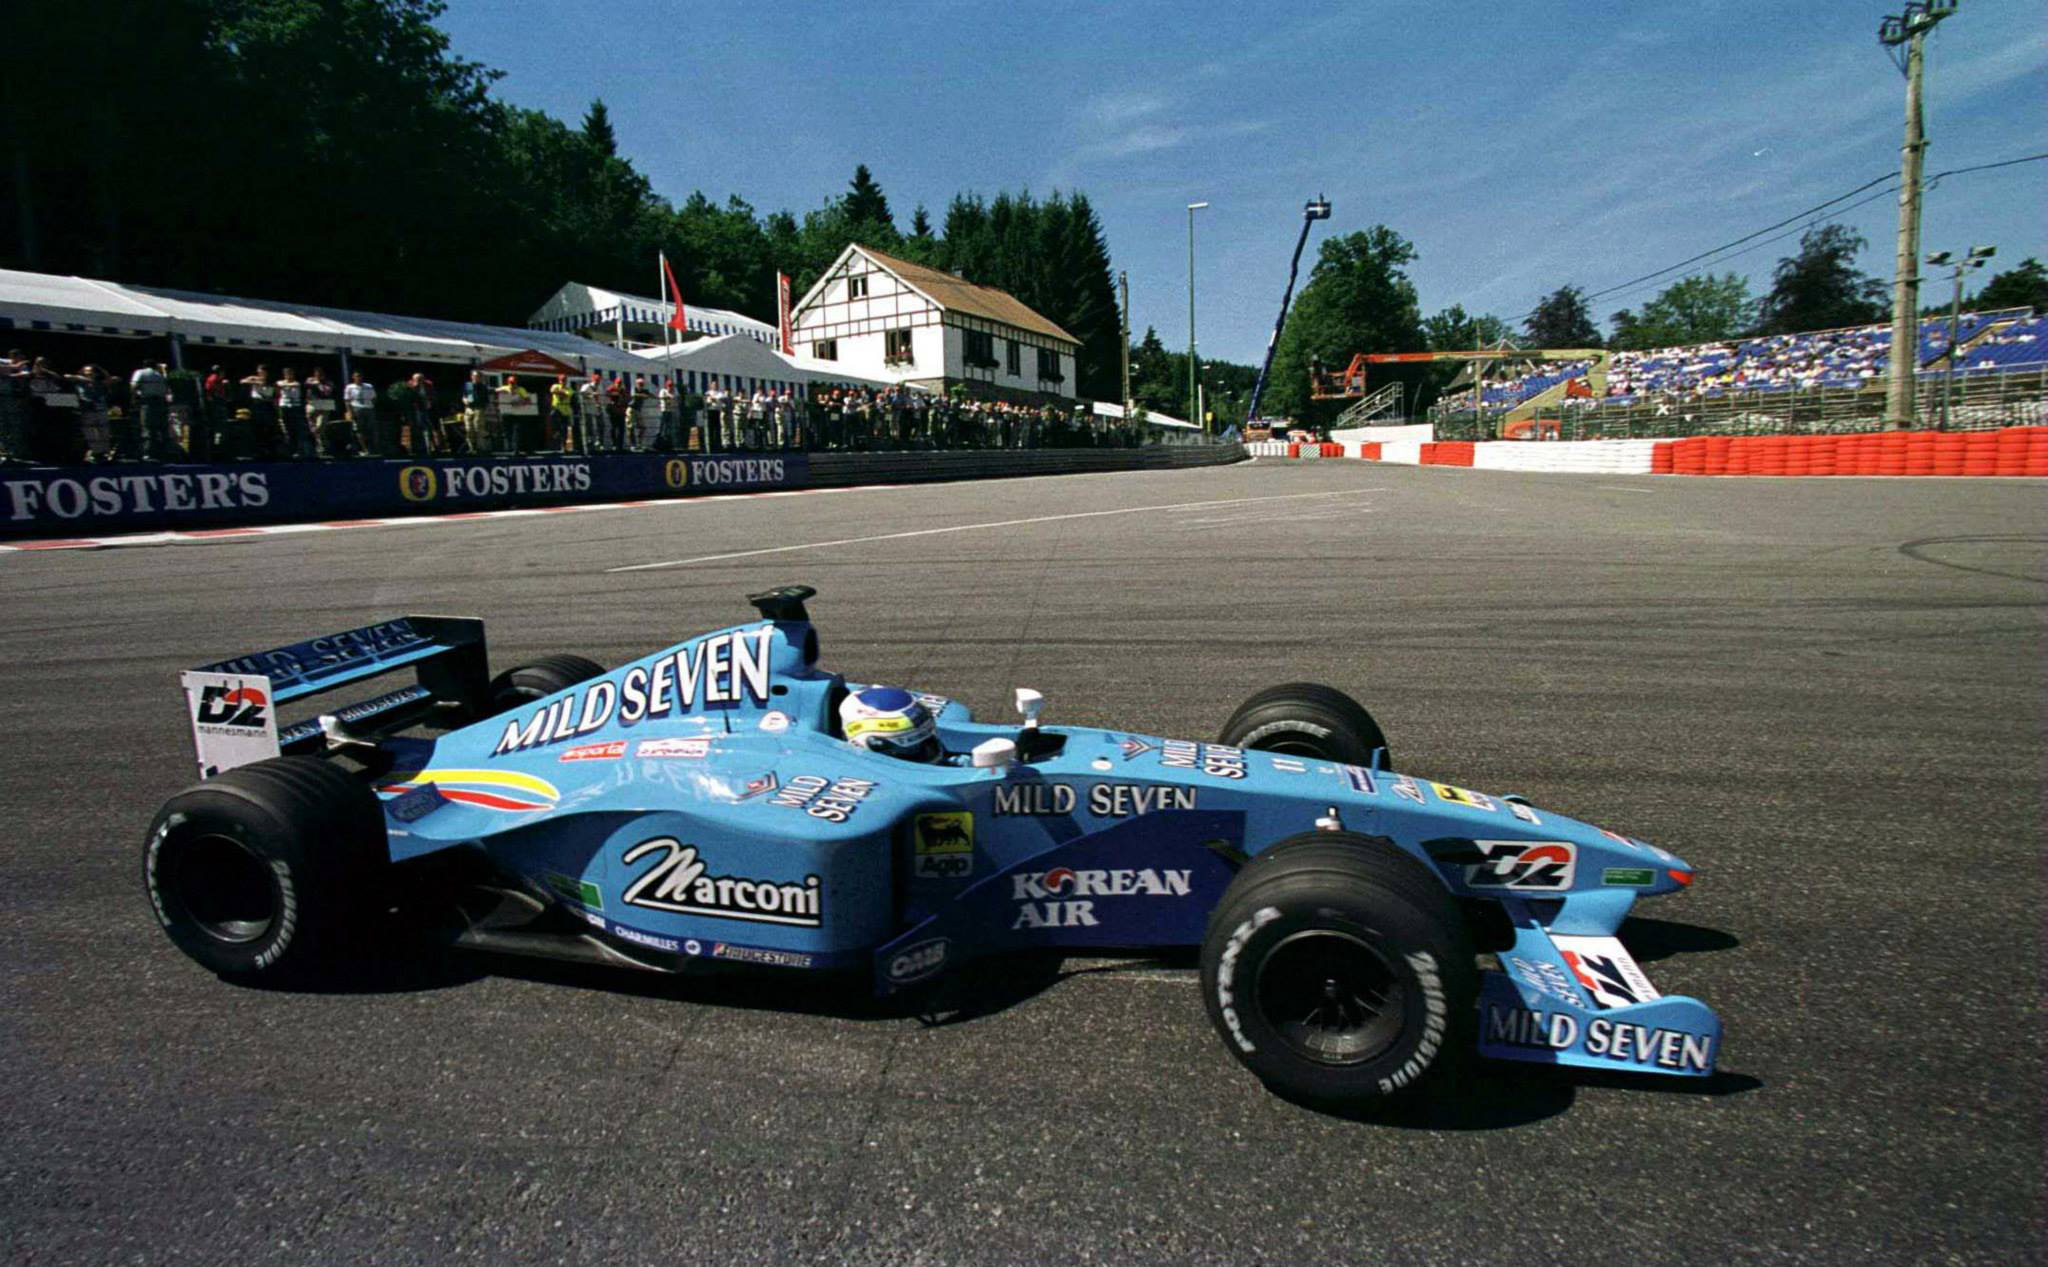 13 Belgian Grand Prix Belgium Circuit de Spa-Francorchamps, Stavelot p belgian gp fisichella.jpg